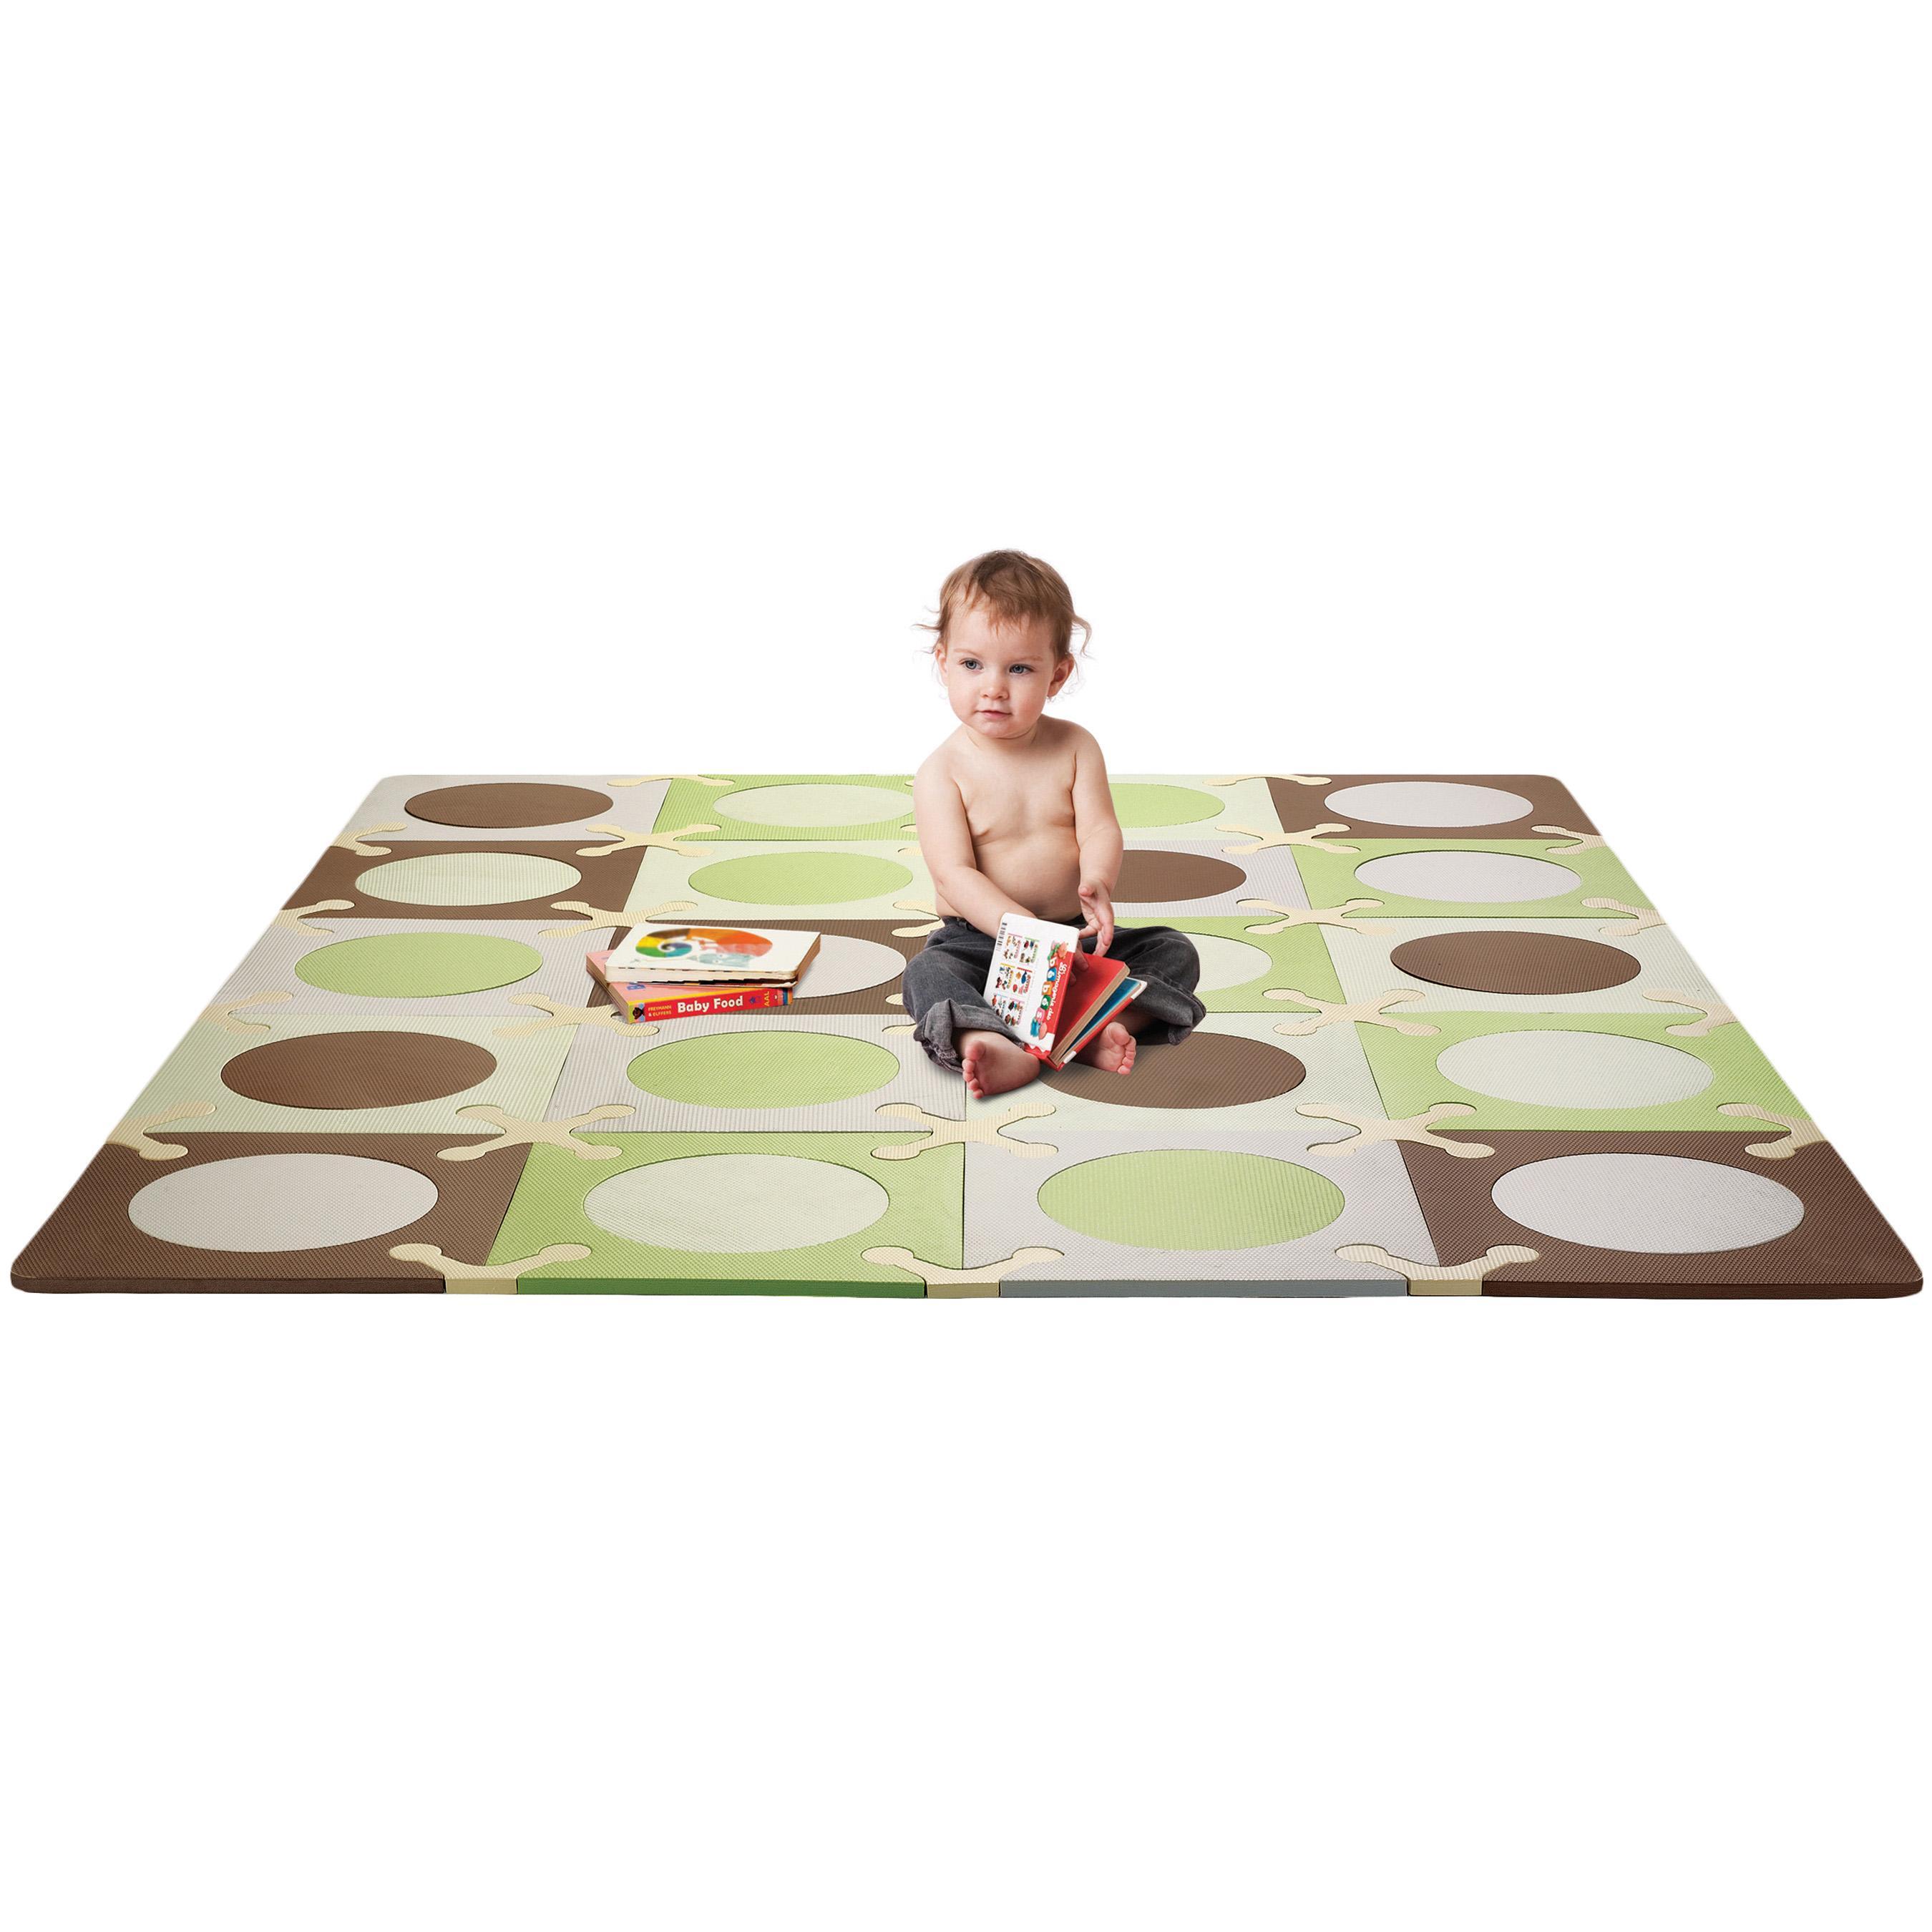 Amazon Com Skip Hop Playspot Floor Mat Green Brown 20